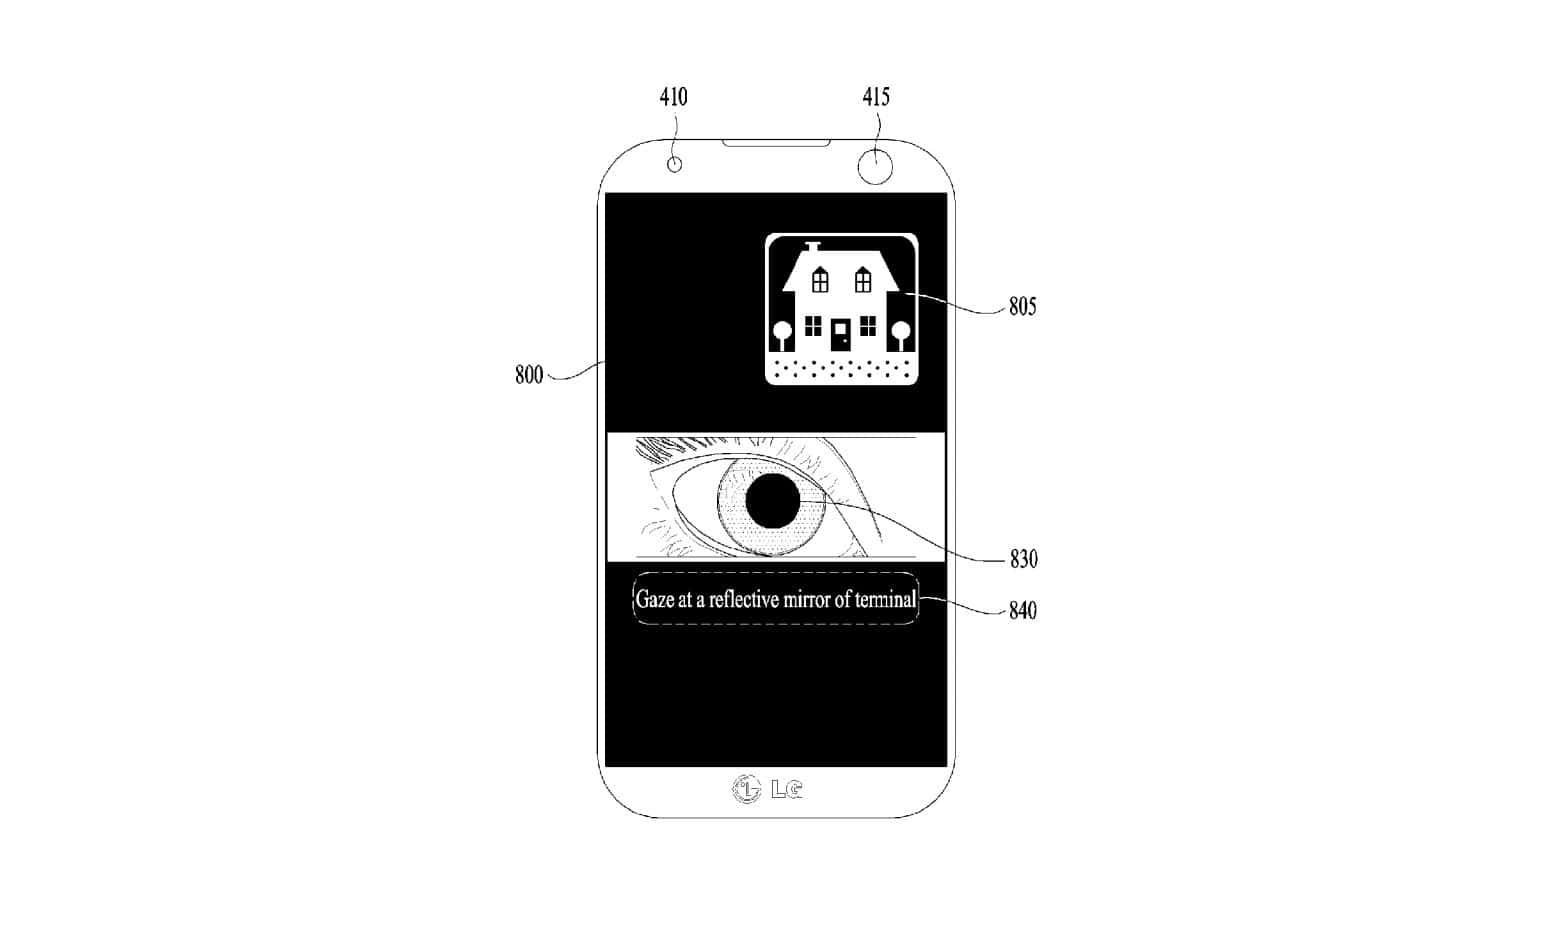 LG Iris WIPO Patent 9